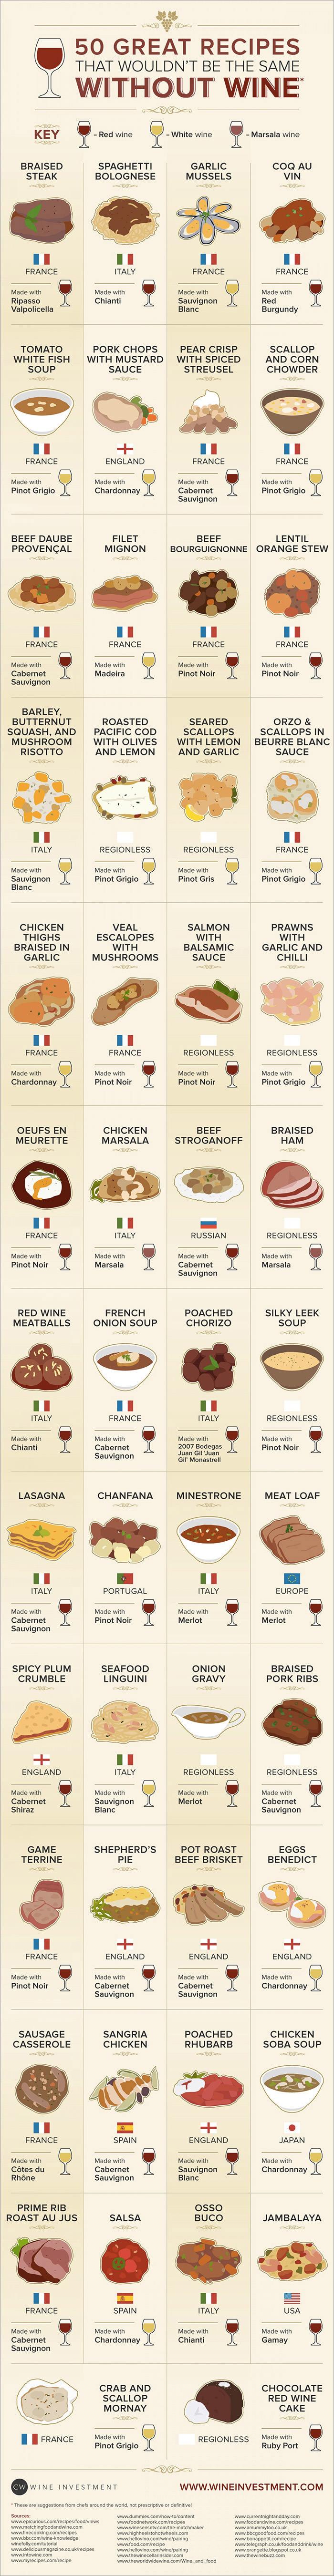 wine-recipes